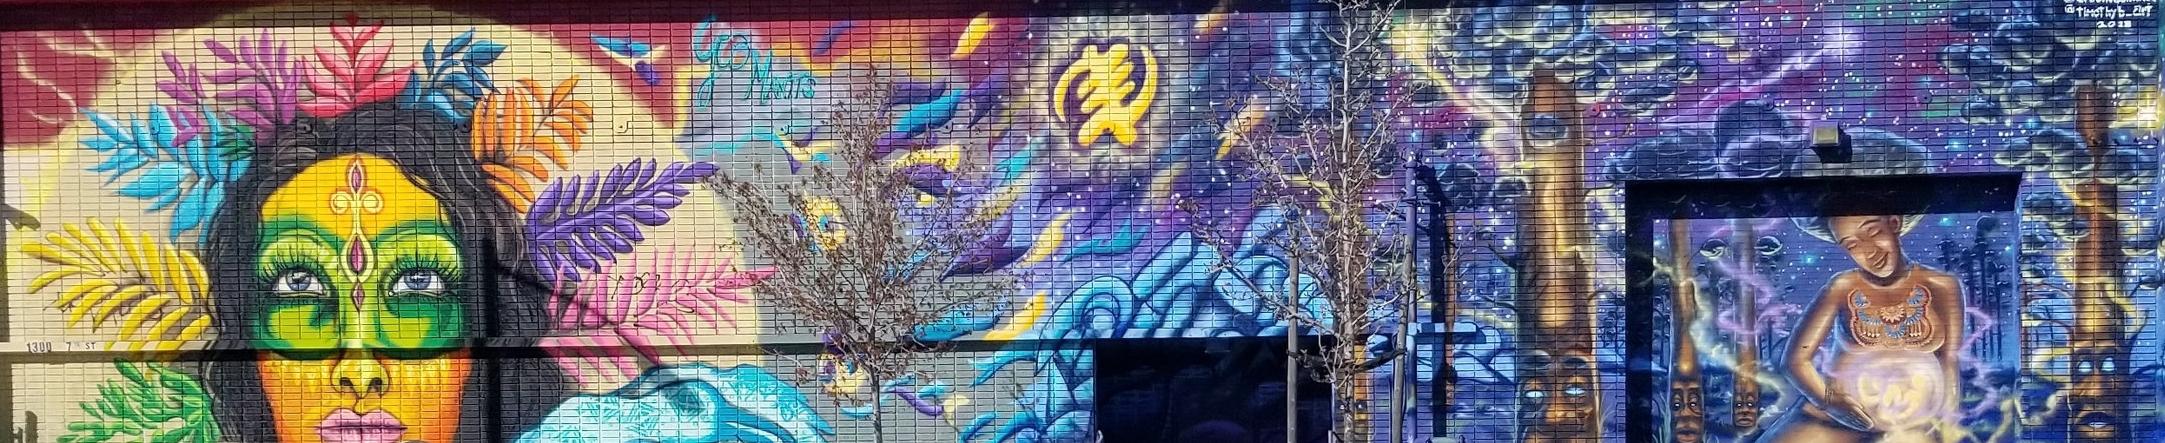 7st. West Oakland - 2018